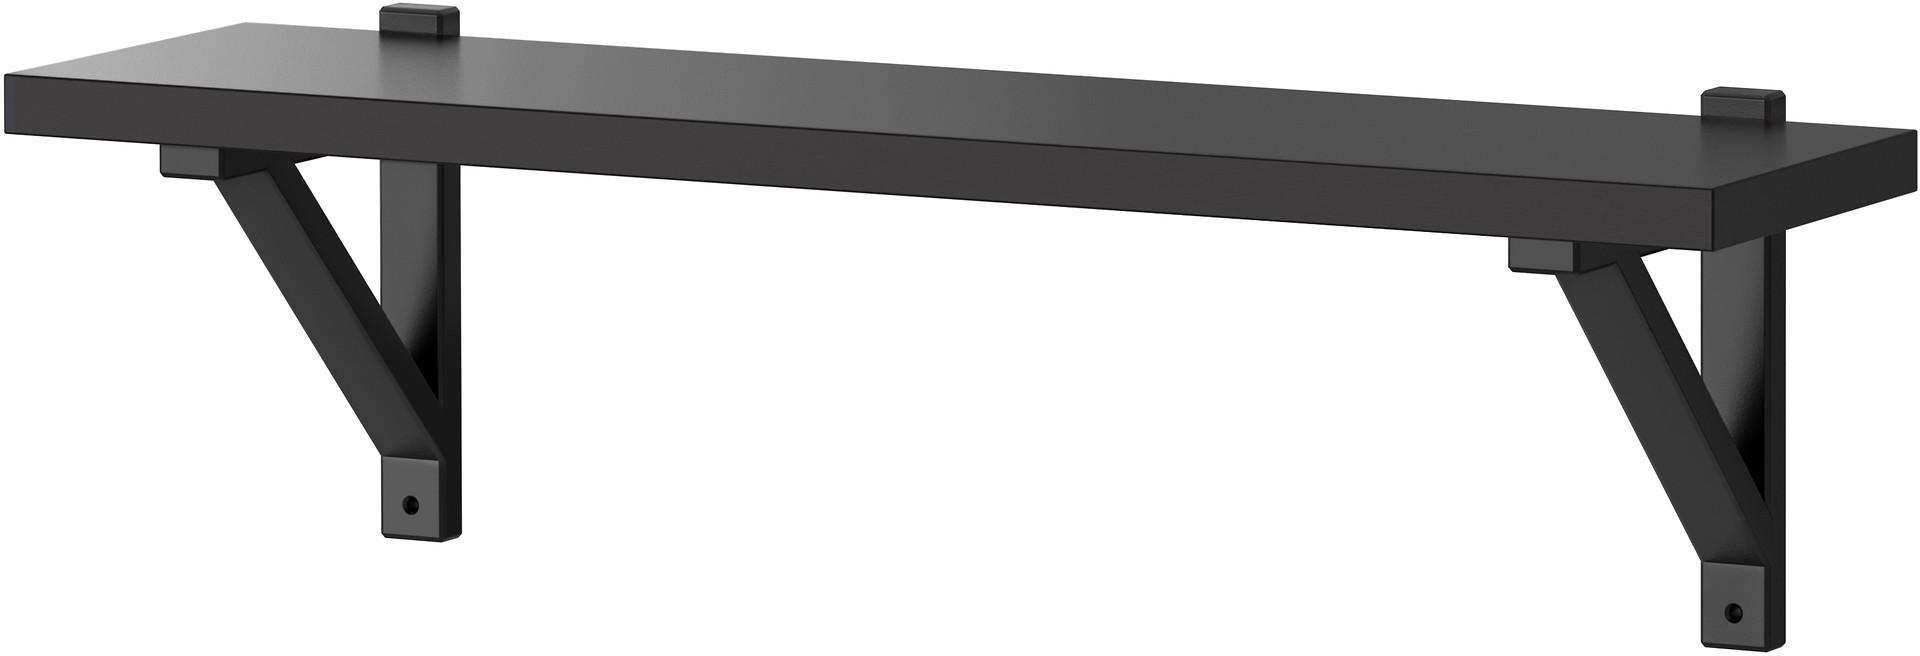 EKBY JÄRPEN / EKBY VALTER Wall shelf - black-brown/black - IKEA